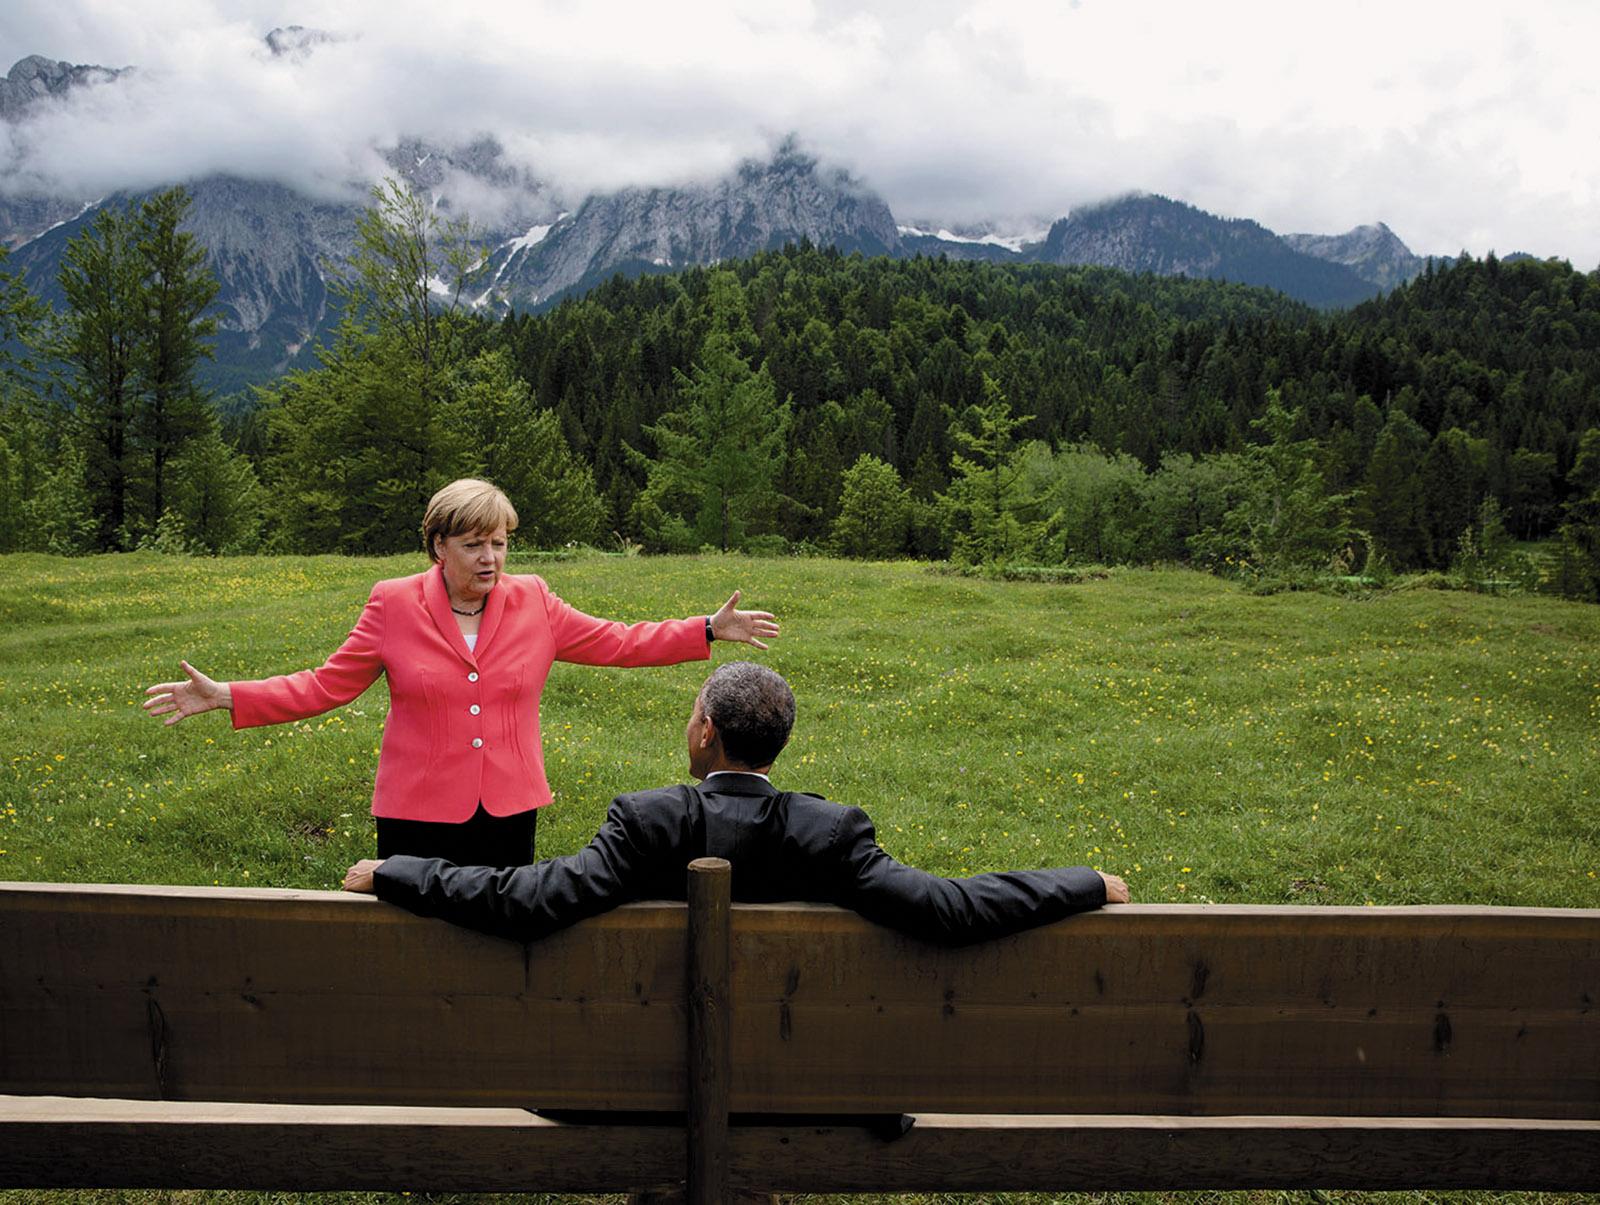 President Barack Obama and German Chancellor Angela Merkel at the G7 Summit, Krün, Germany, June 2015